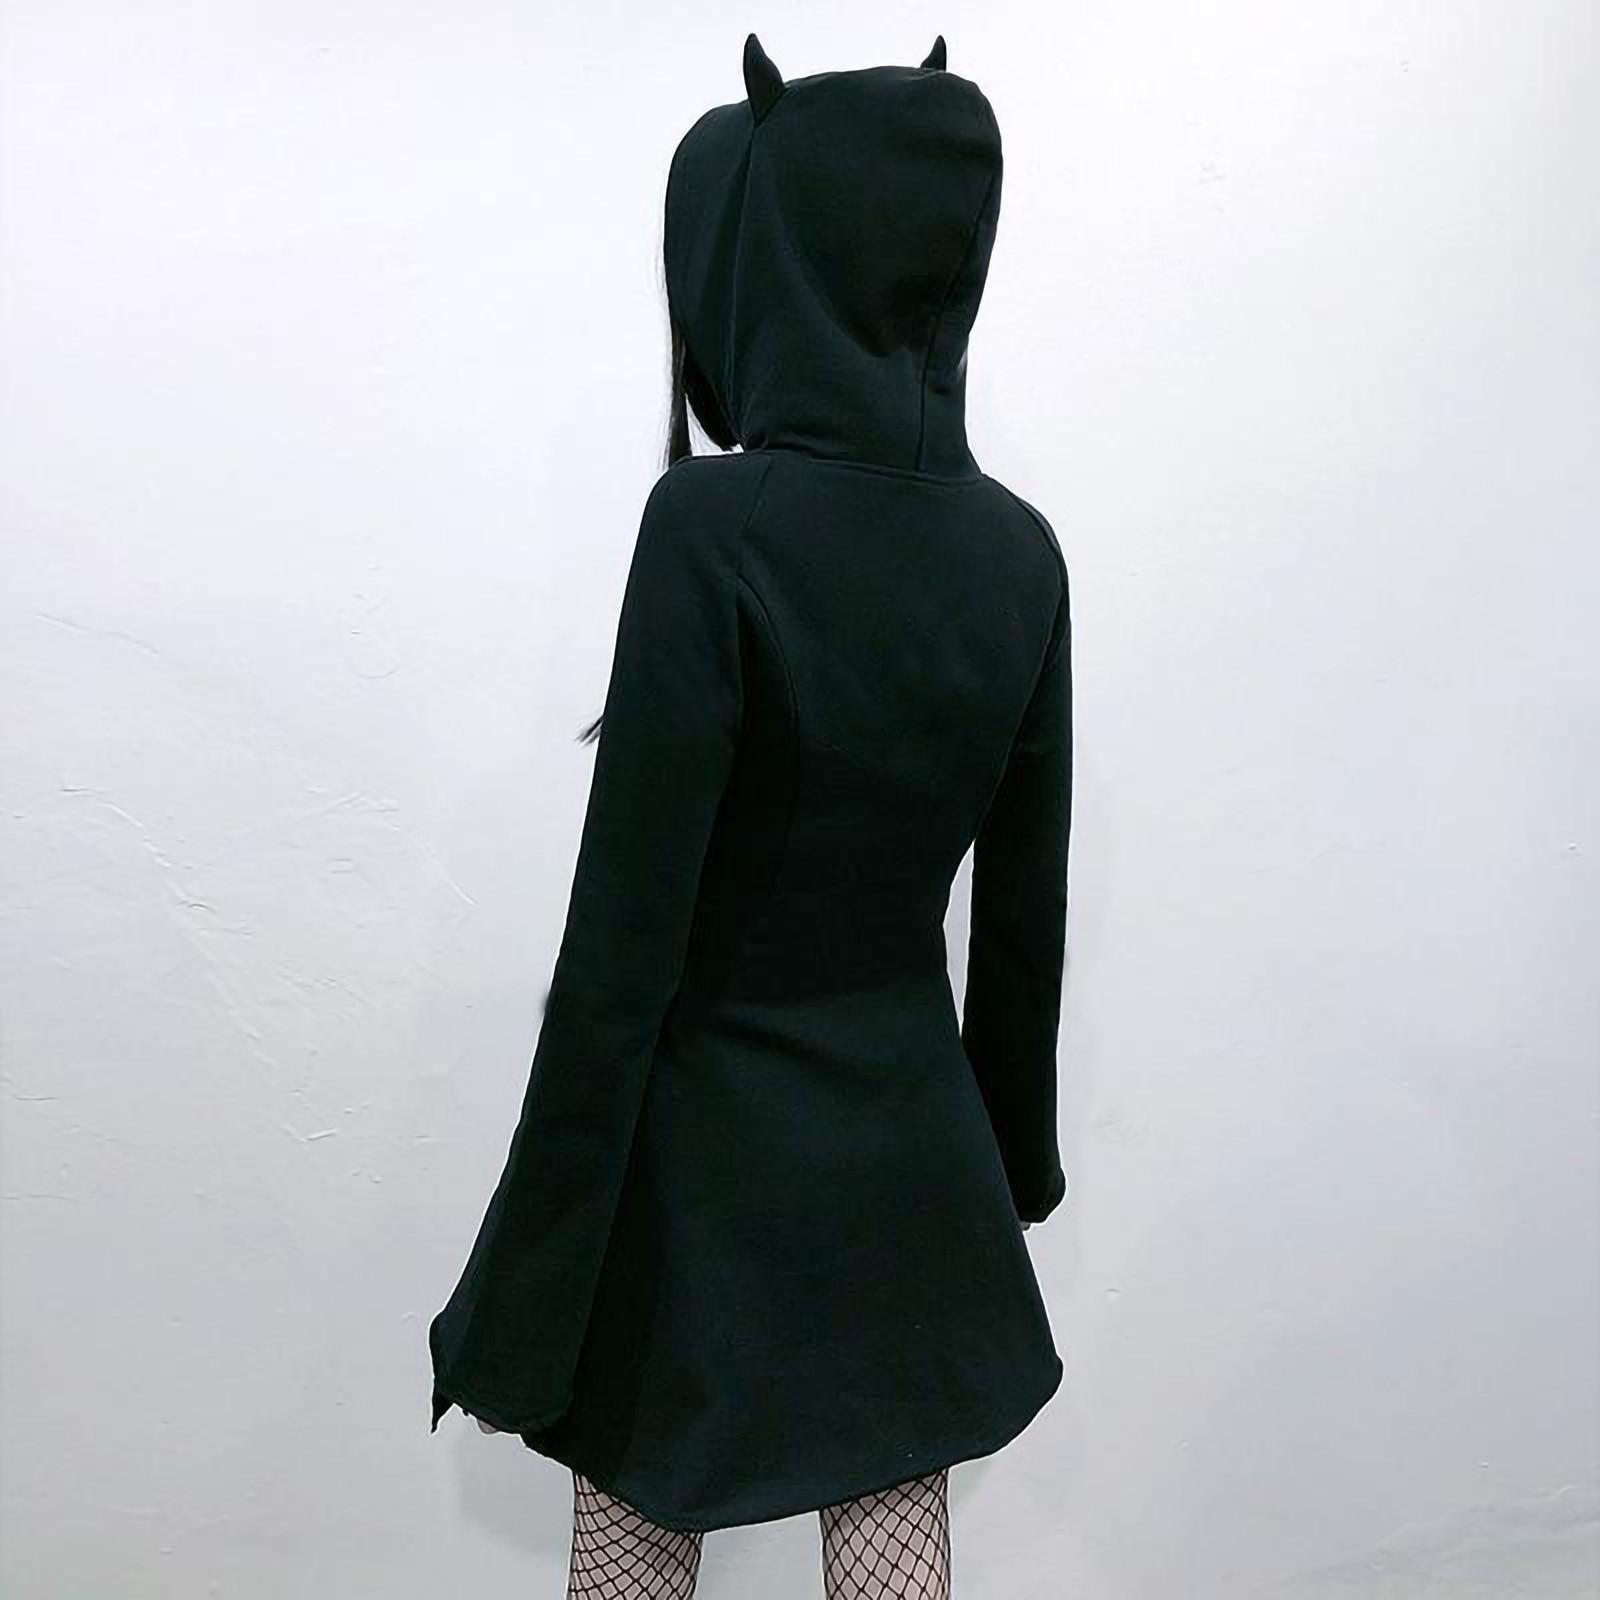 vestido Women s Gothic clothing Dress Cat Ear Hoodie Pullover Long Sleeve Hooded Cute Sweatshirt Dress